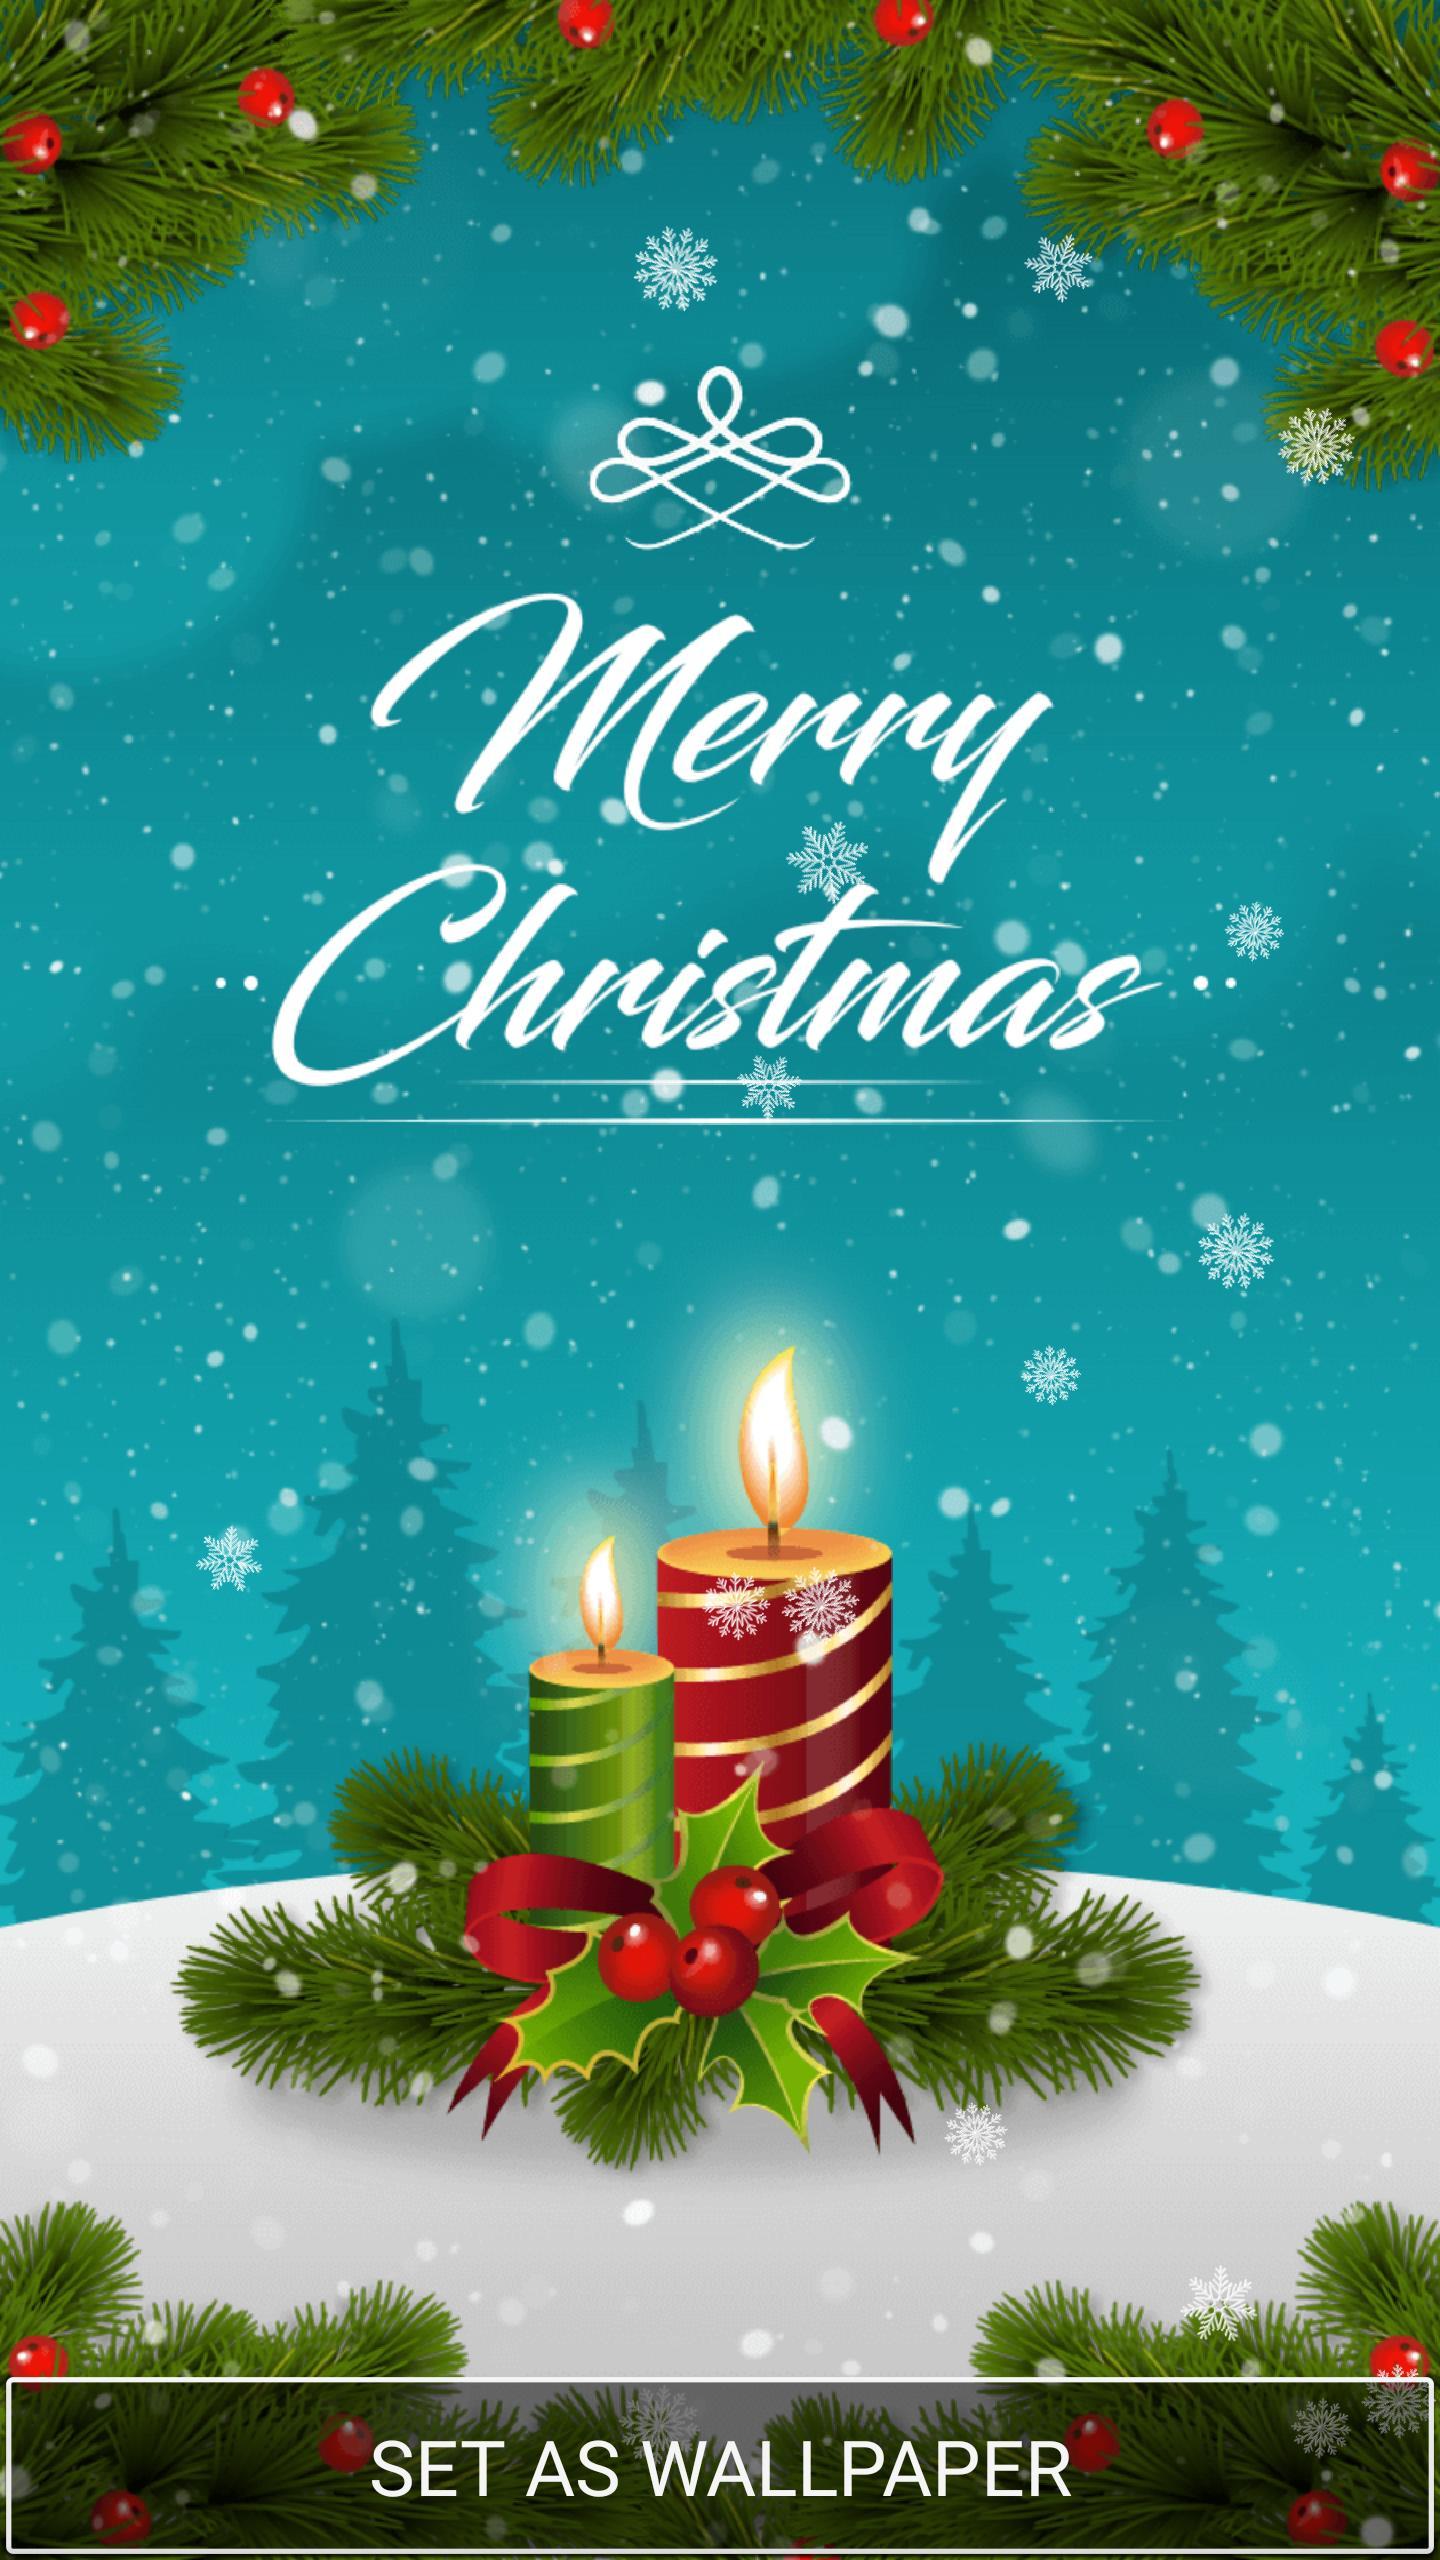 Sfondi Natalizi Gratis Animati.Sfondi Animati Natale Gratis For Android Apk Download